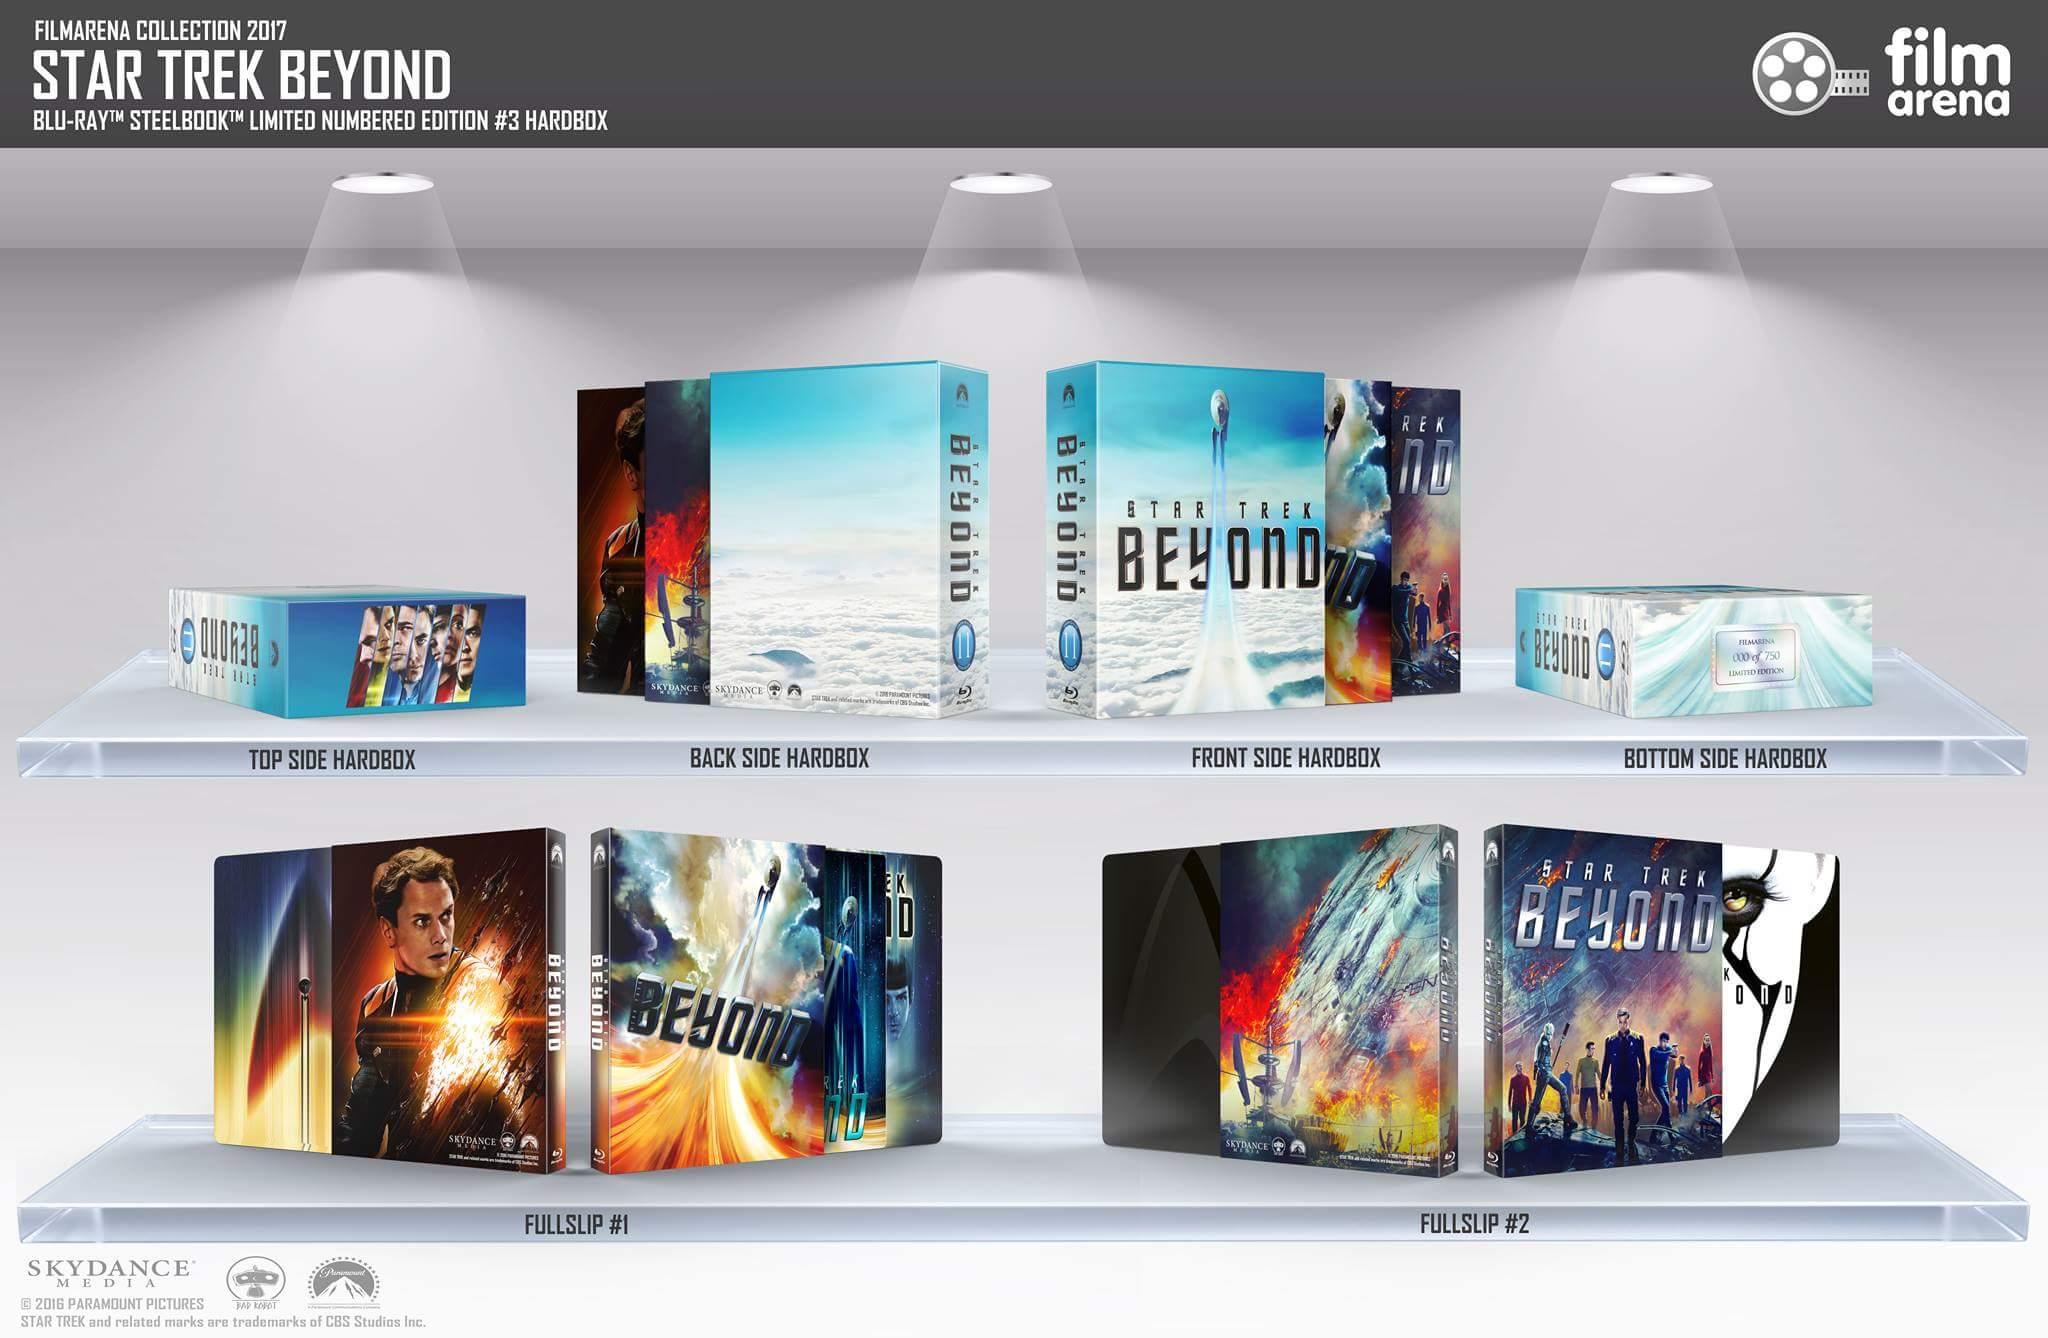 Star Trek Beyond steelbook filmarena 3